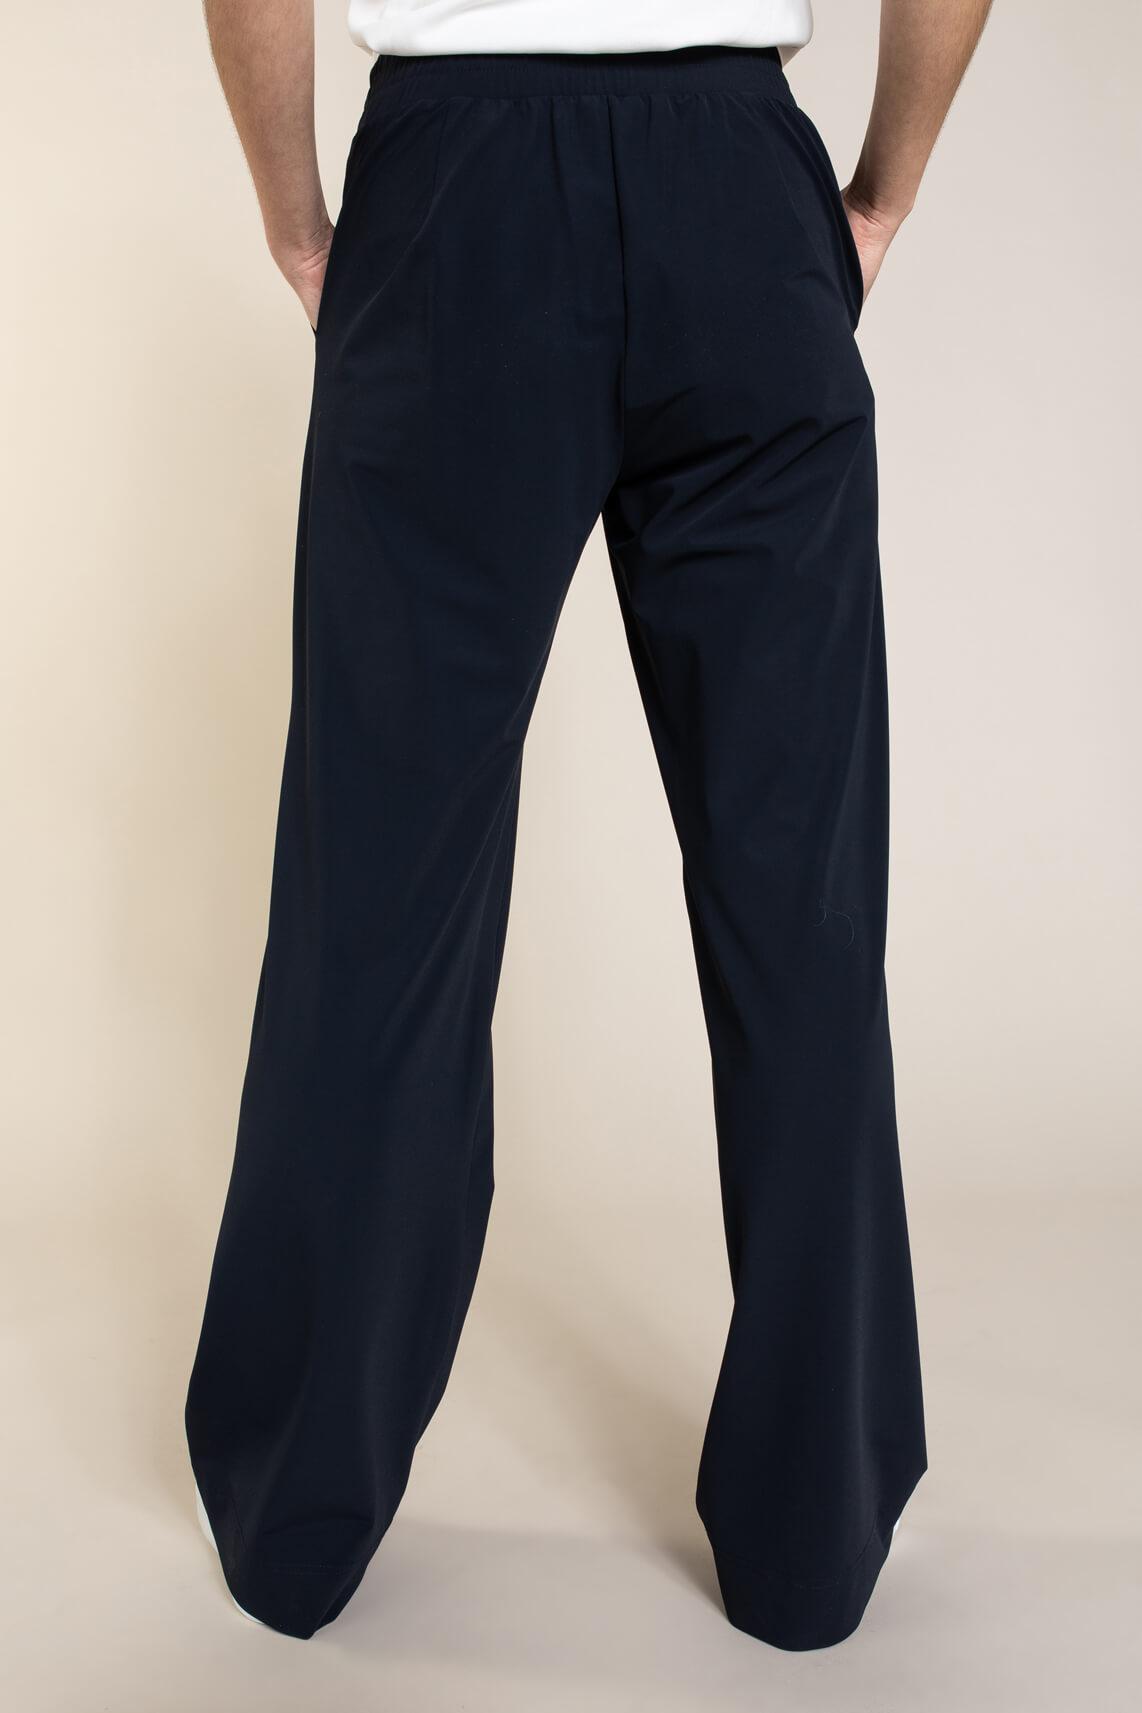 Anna Dames Pantalon van travel kwaliteit Blauw